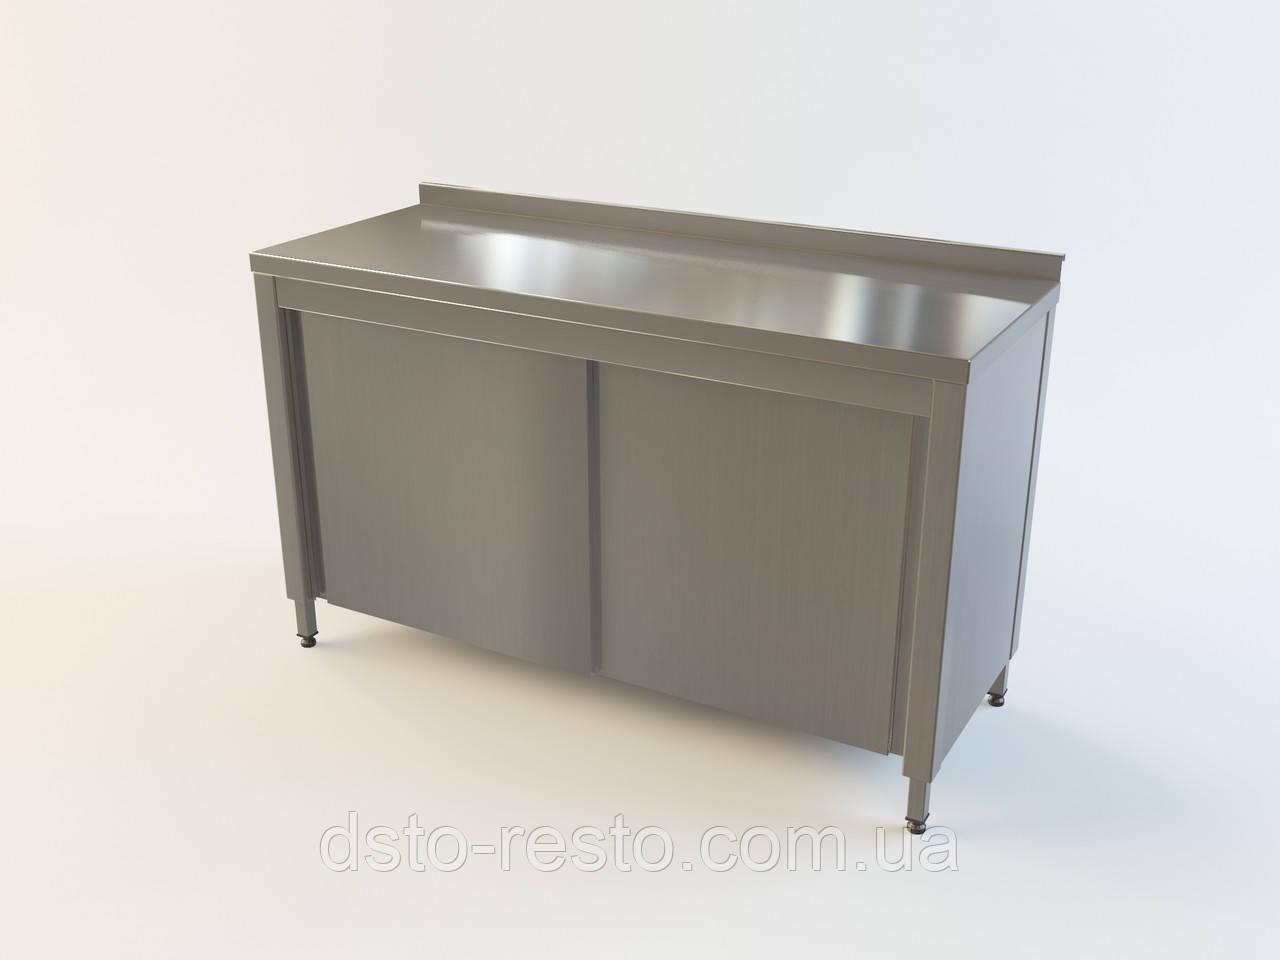 Стол тепловой 1200/600/850 мм